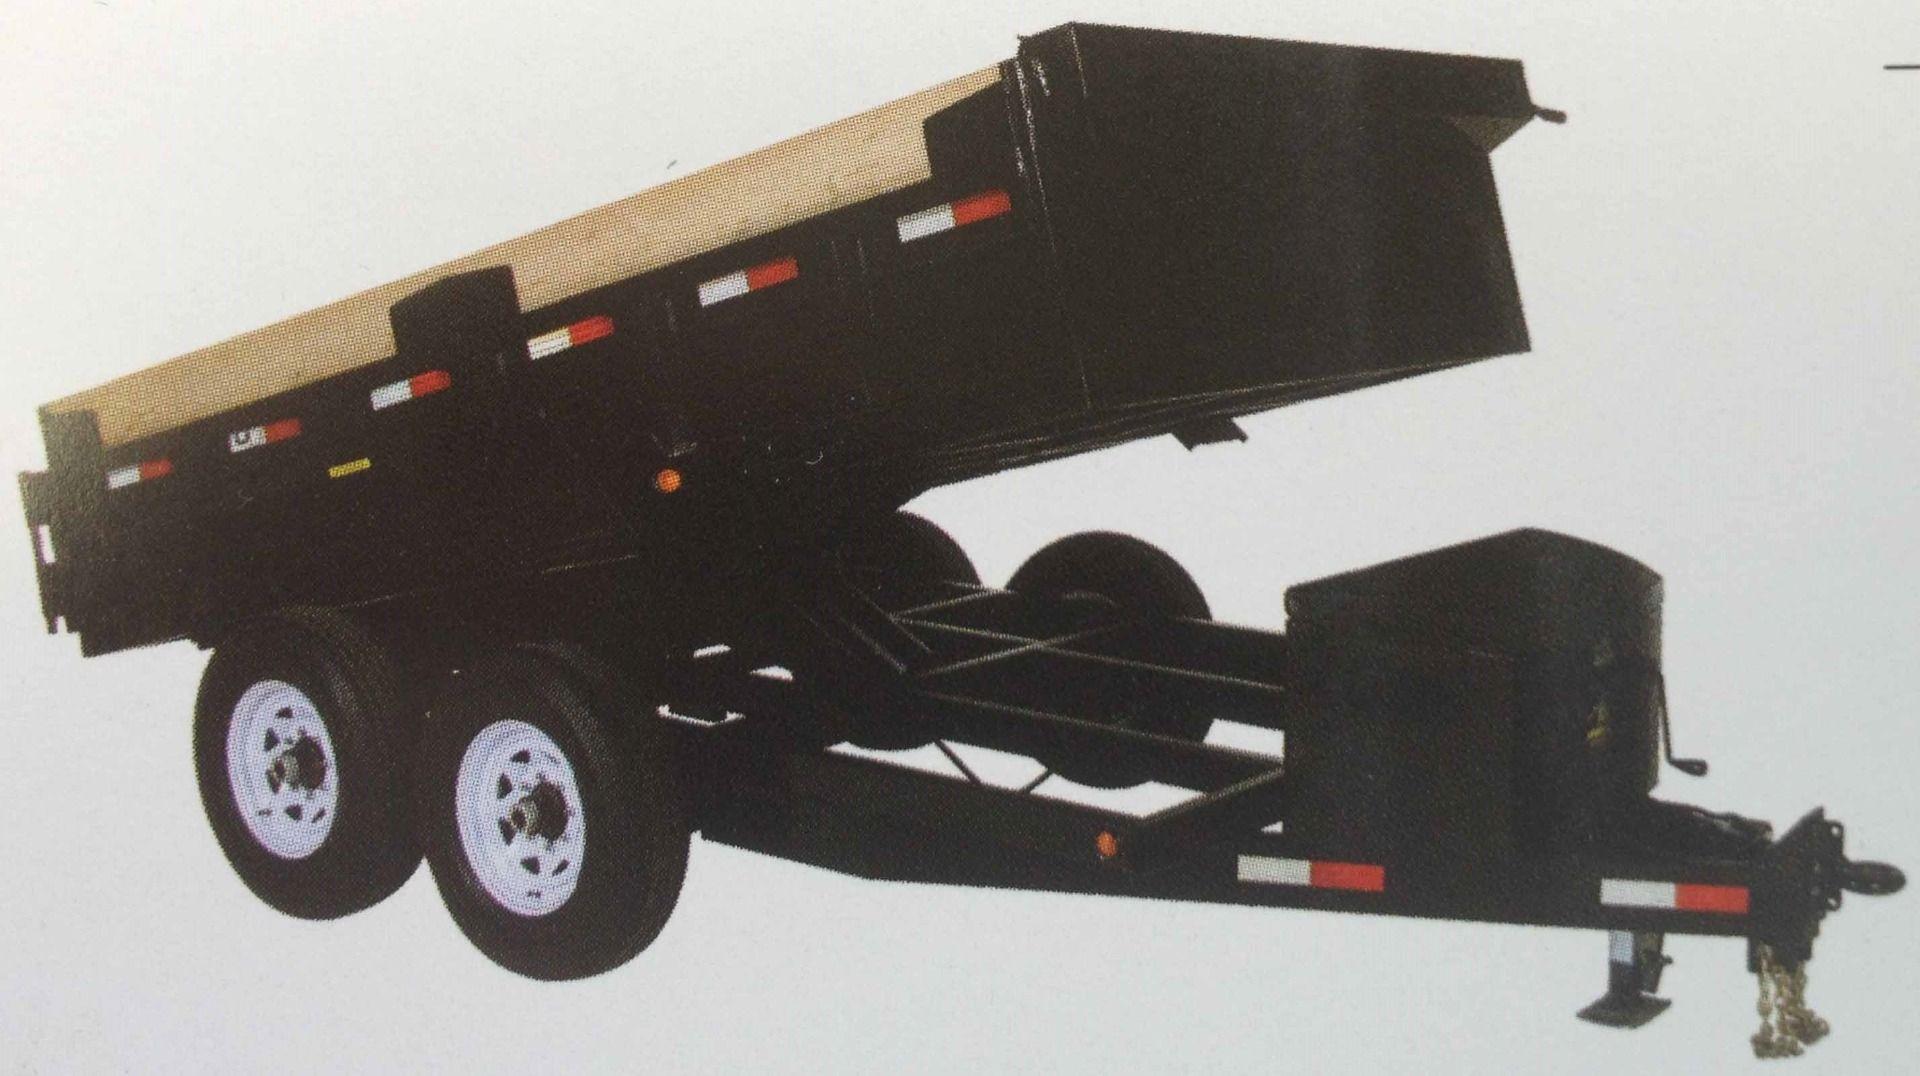 Medium Duty Dump Tandem Trailer MDD510 by JDJ (5' W x 10' L)